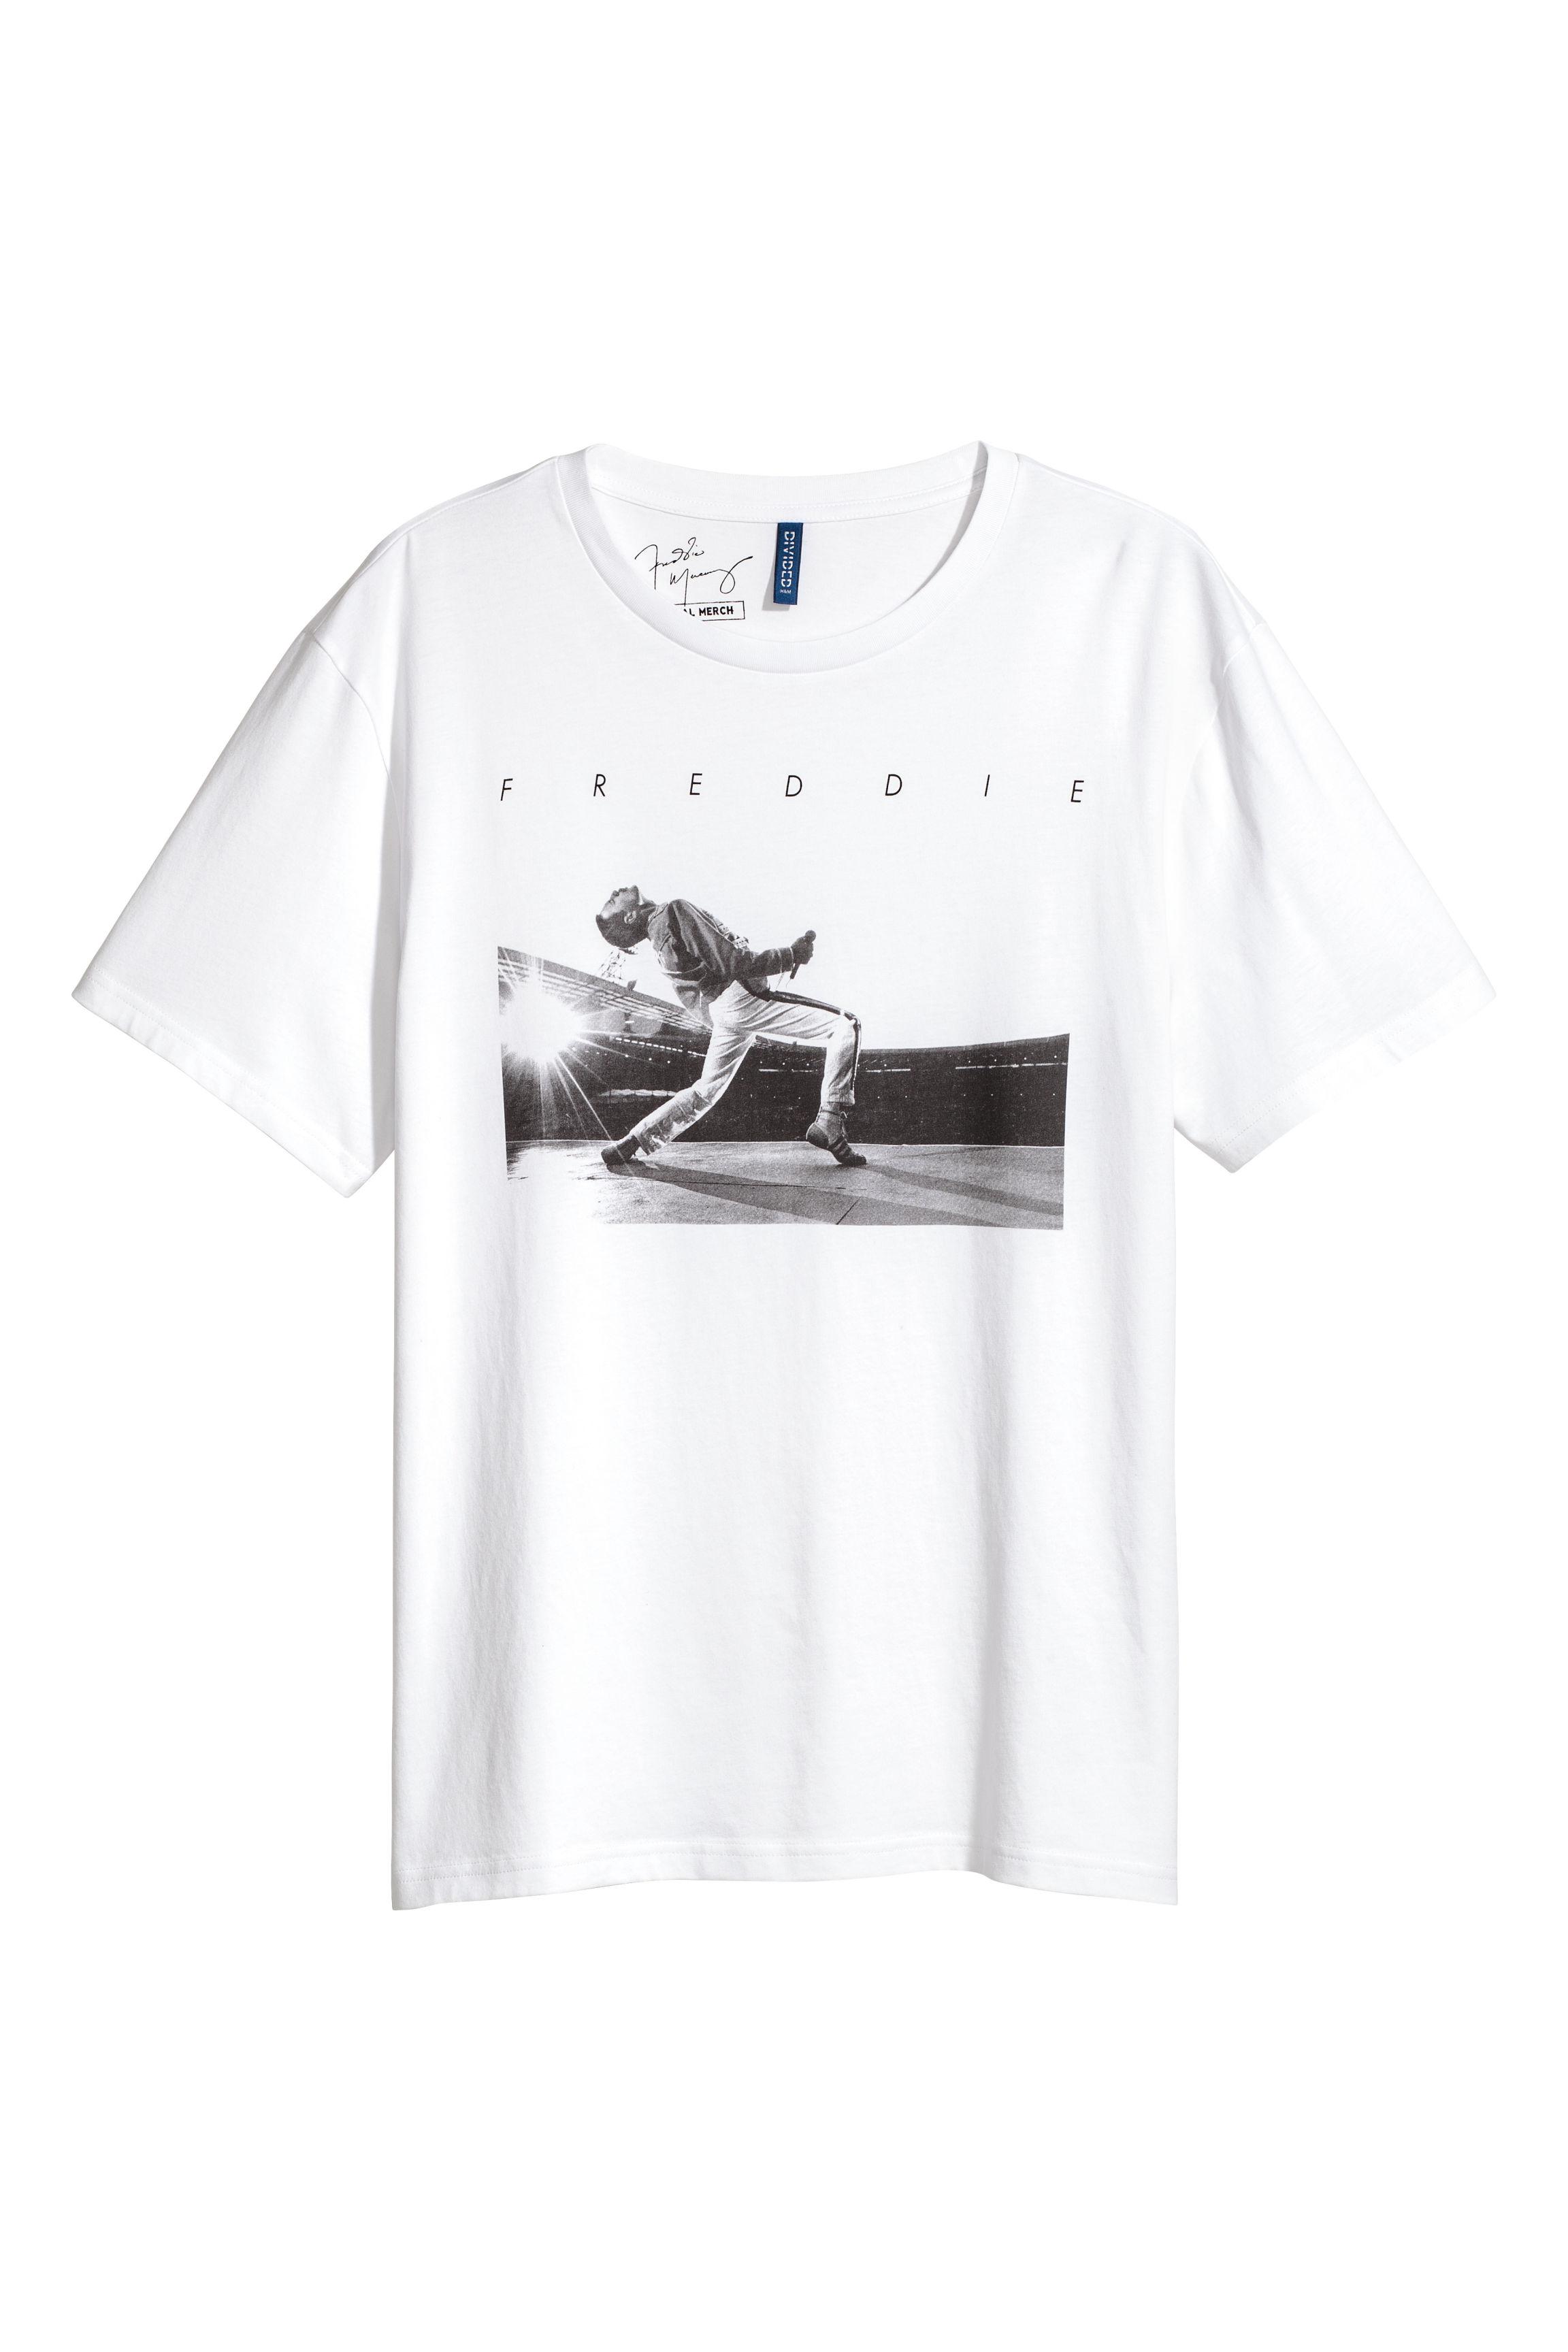 Koszulka z Freddiem w H&M